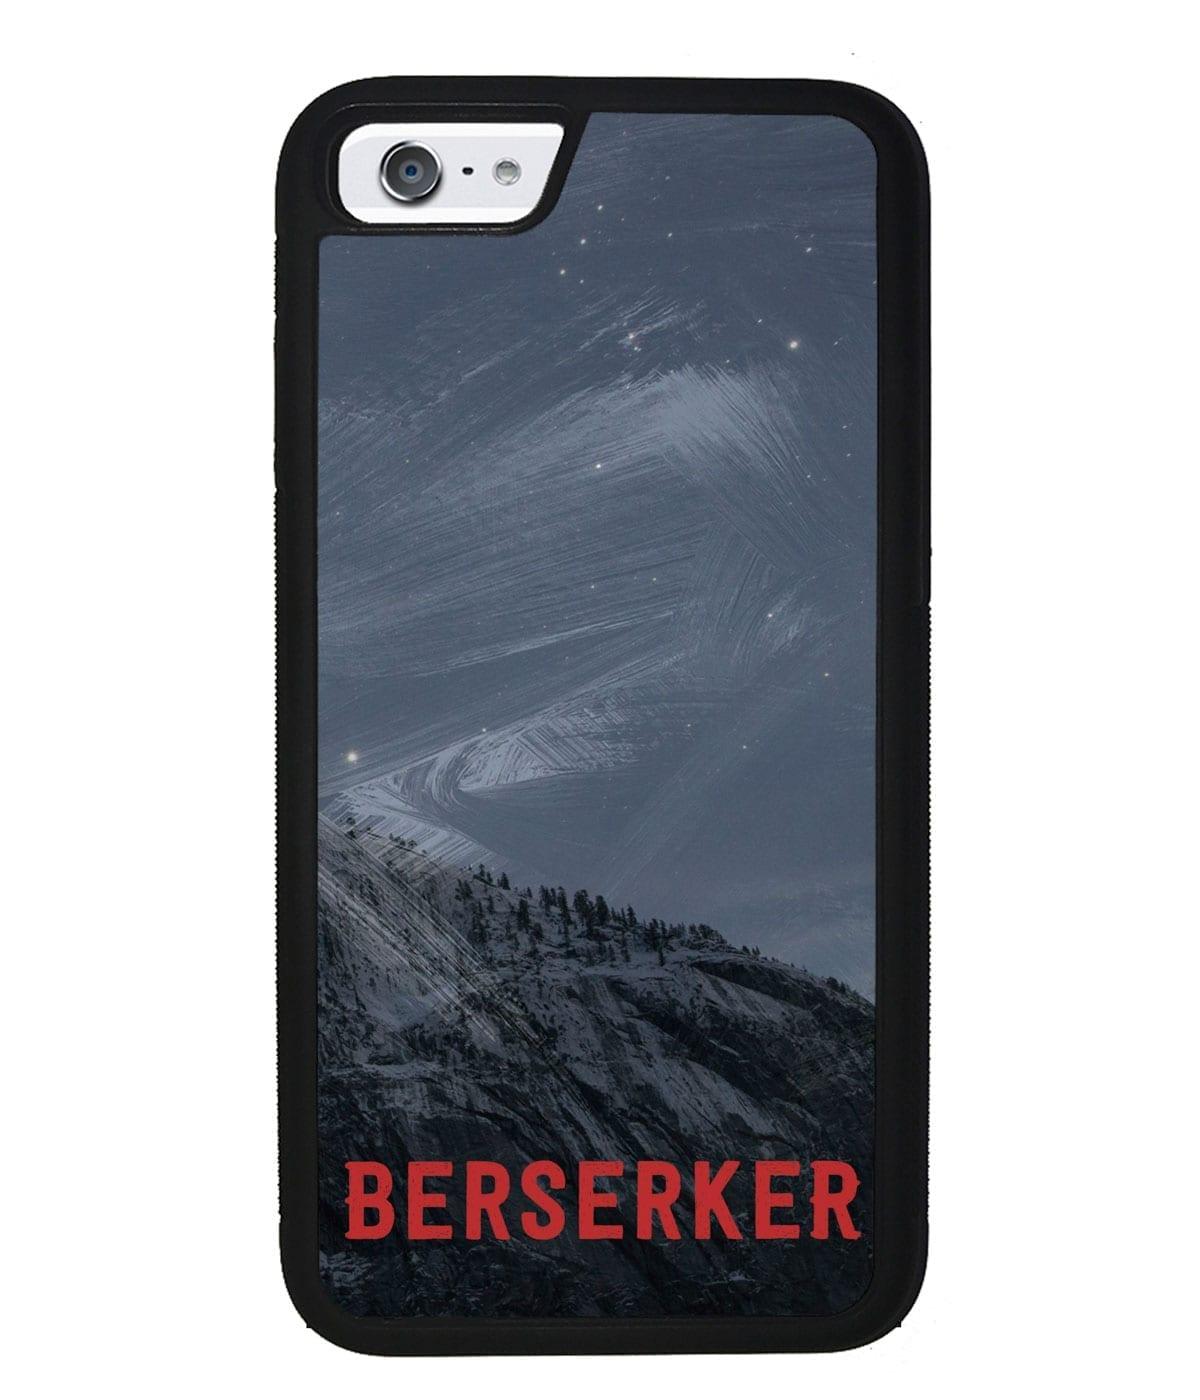 Berserker Phone Case (Apple iPhone)